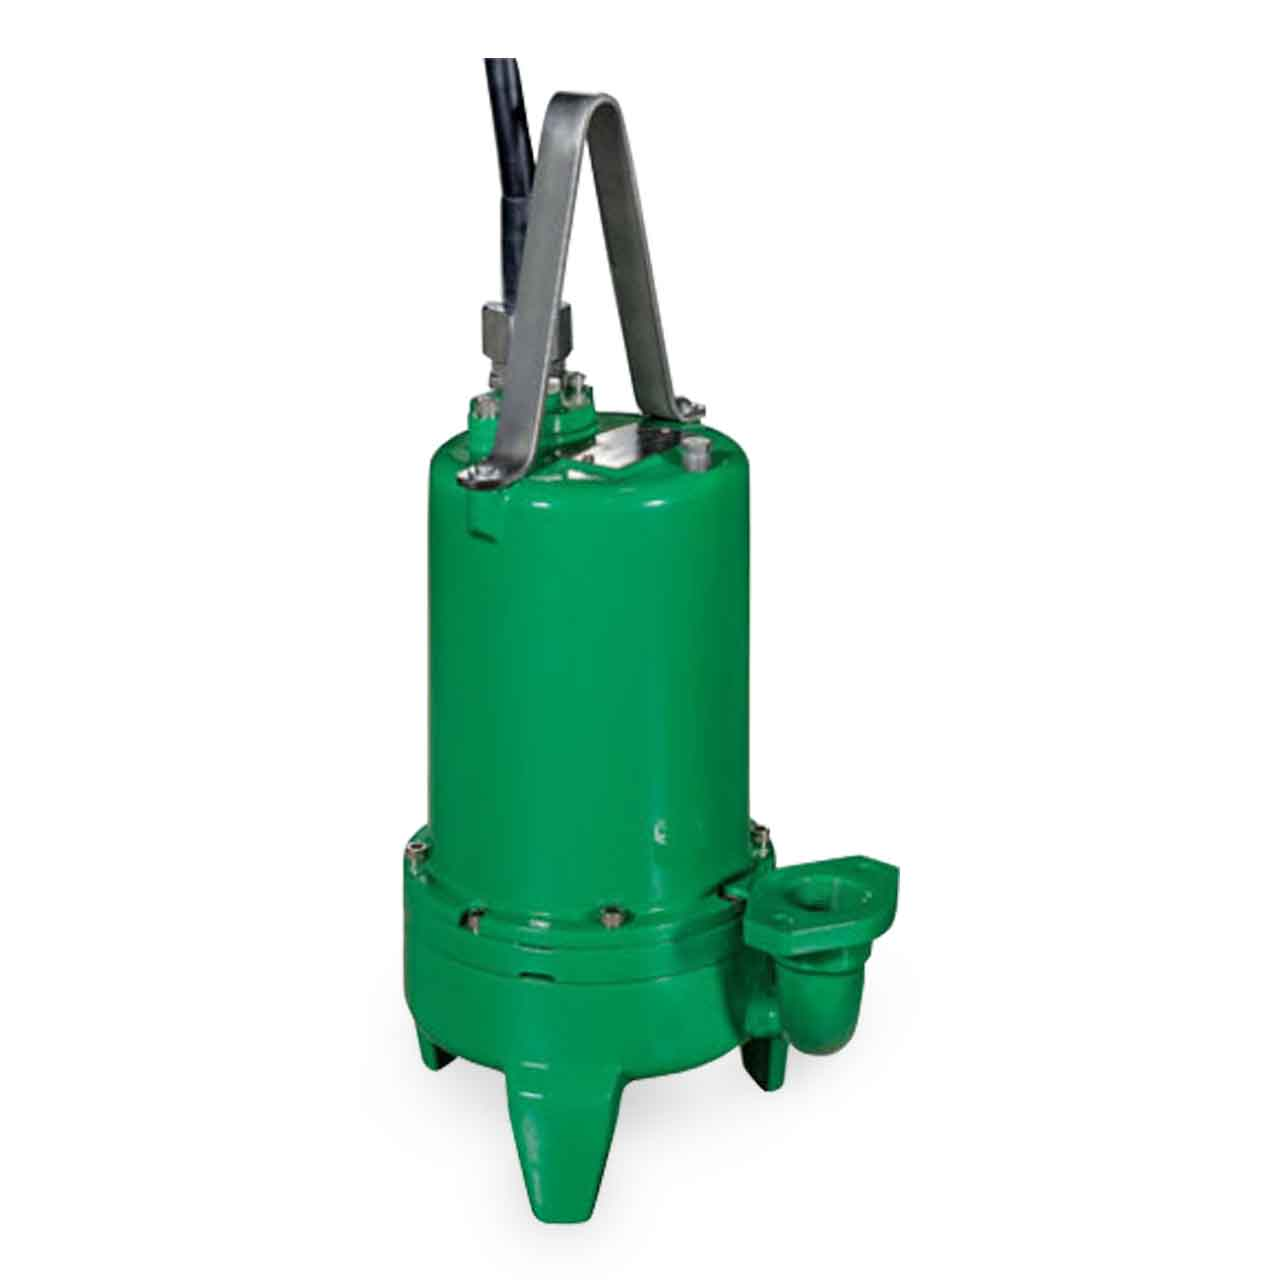 Myers - Myers VS20-23-20 V2 Grinder Pump 2.0 HP 230V 3PH 20' Standard Cord  #MYR28151D002   Myers Grinder Pump Wiring Diagram      RC Worst & Co.